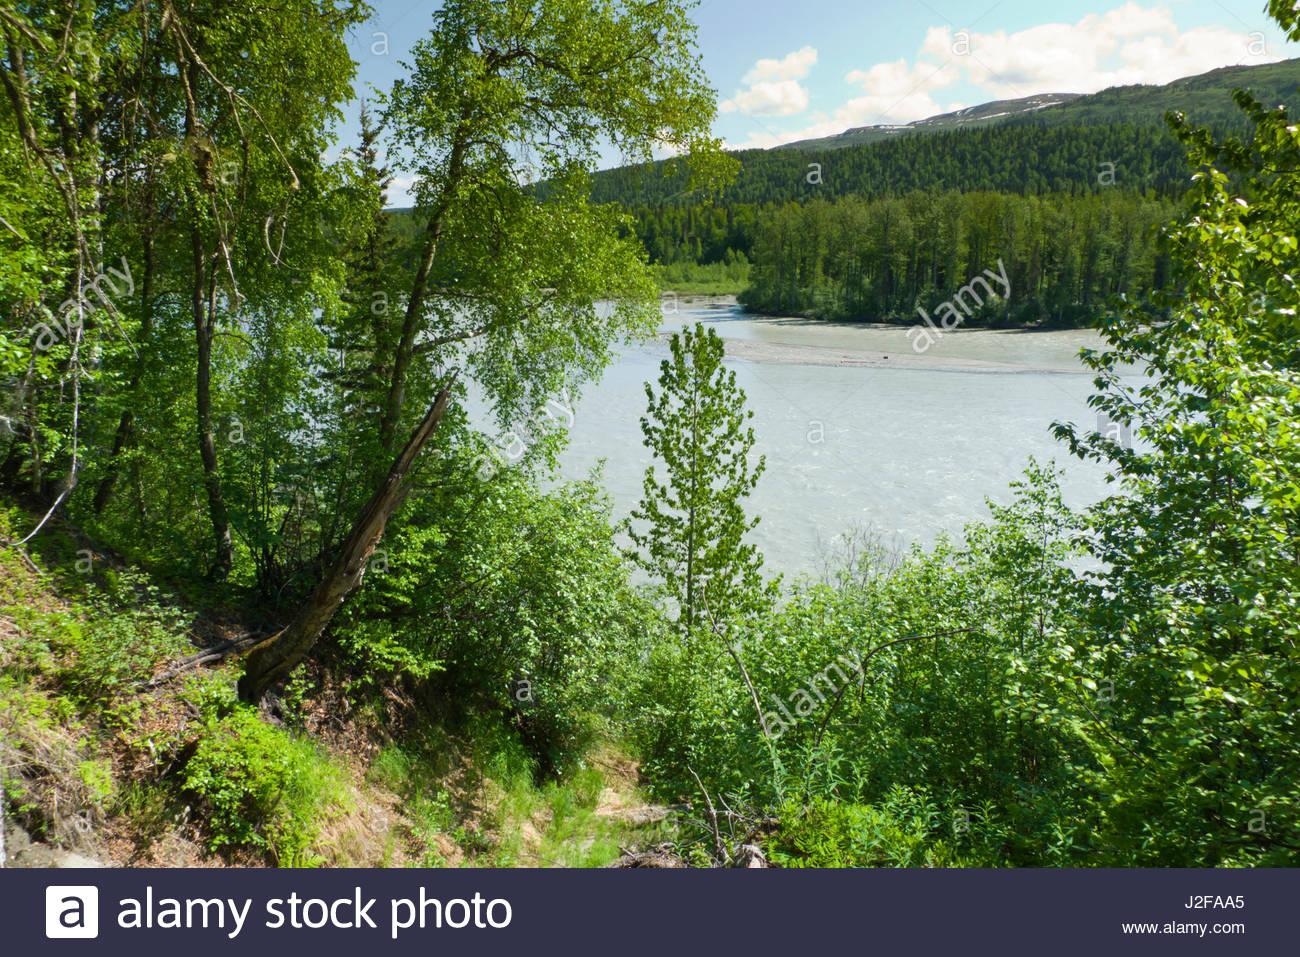 Alaska matanuska susitna county talkeetna - Susitna River Talkeetna Mountains Matanuska Susitna Borough Alaska Usa Stock